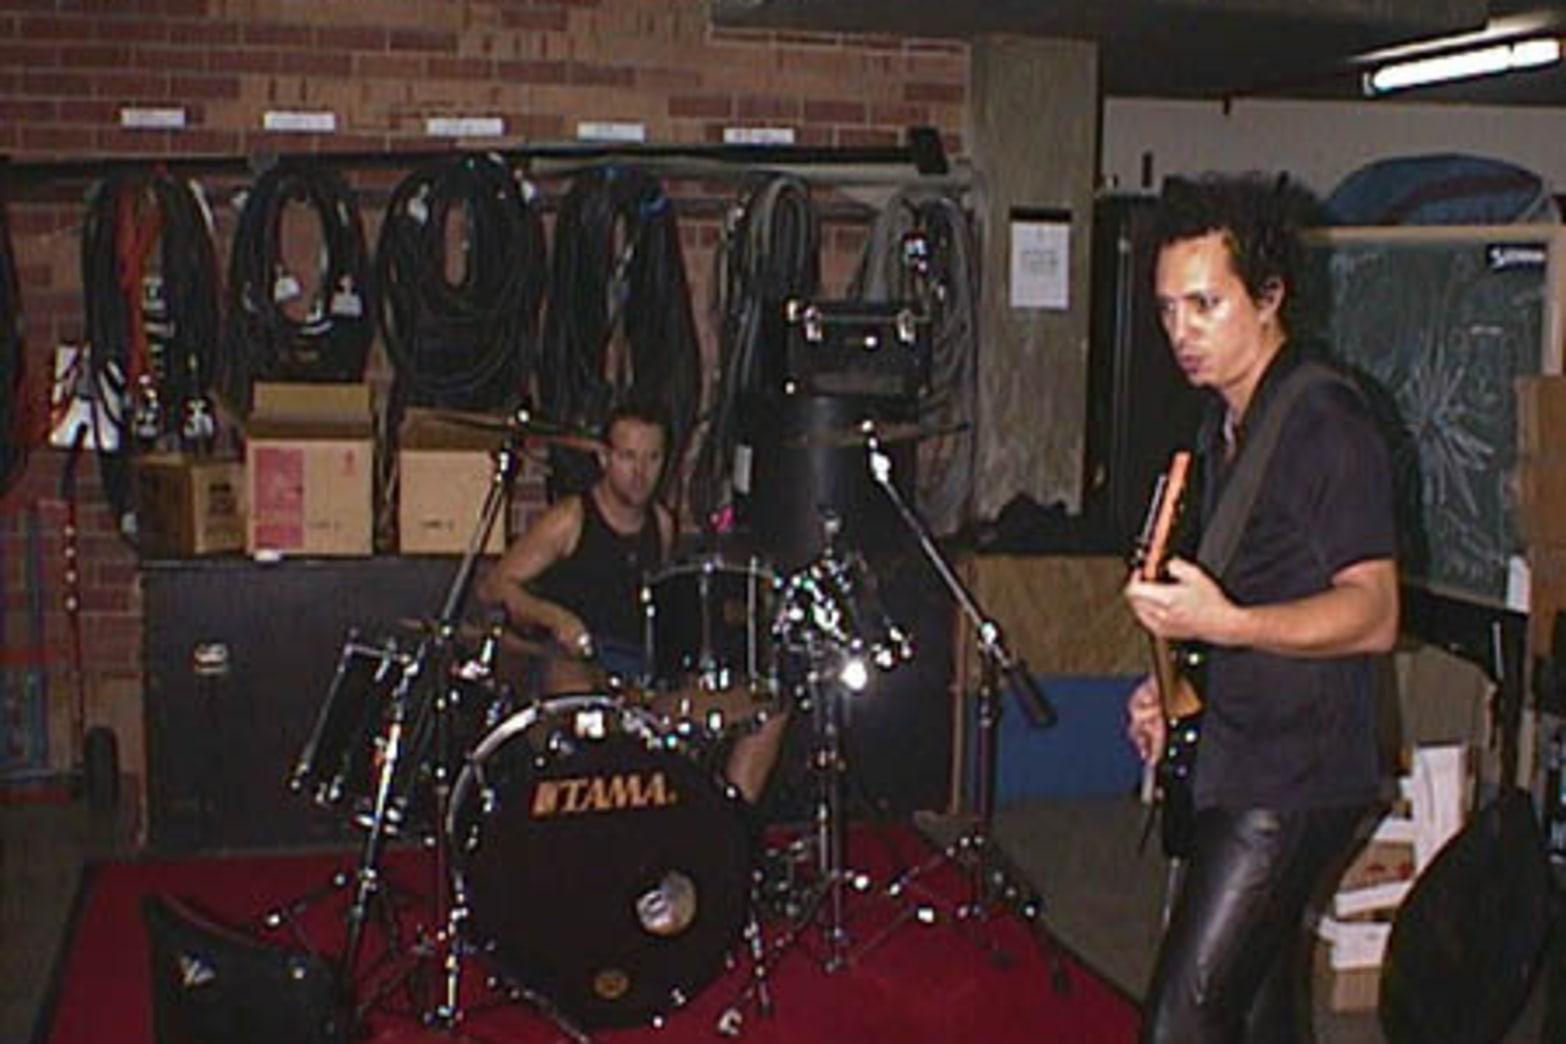 1998-04-11 Perth, Australia   Metallica.com